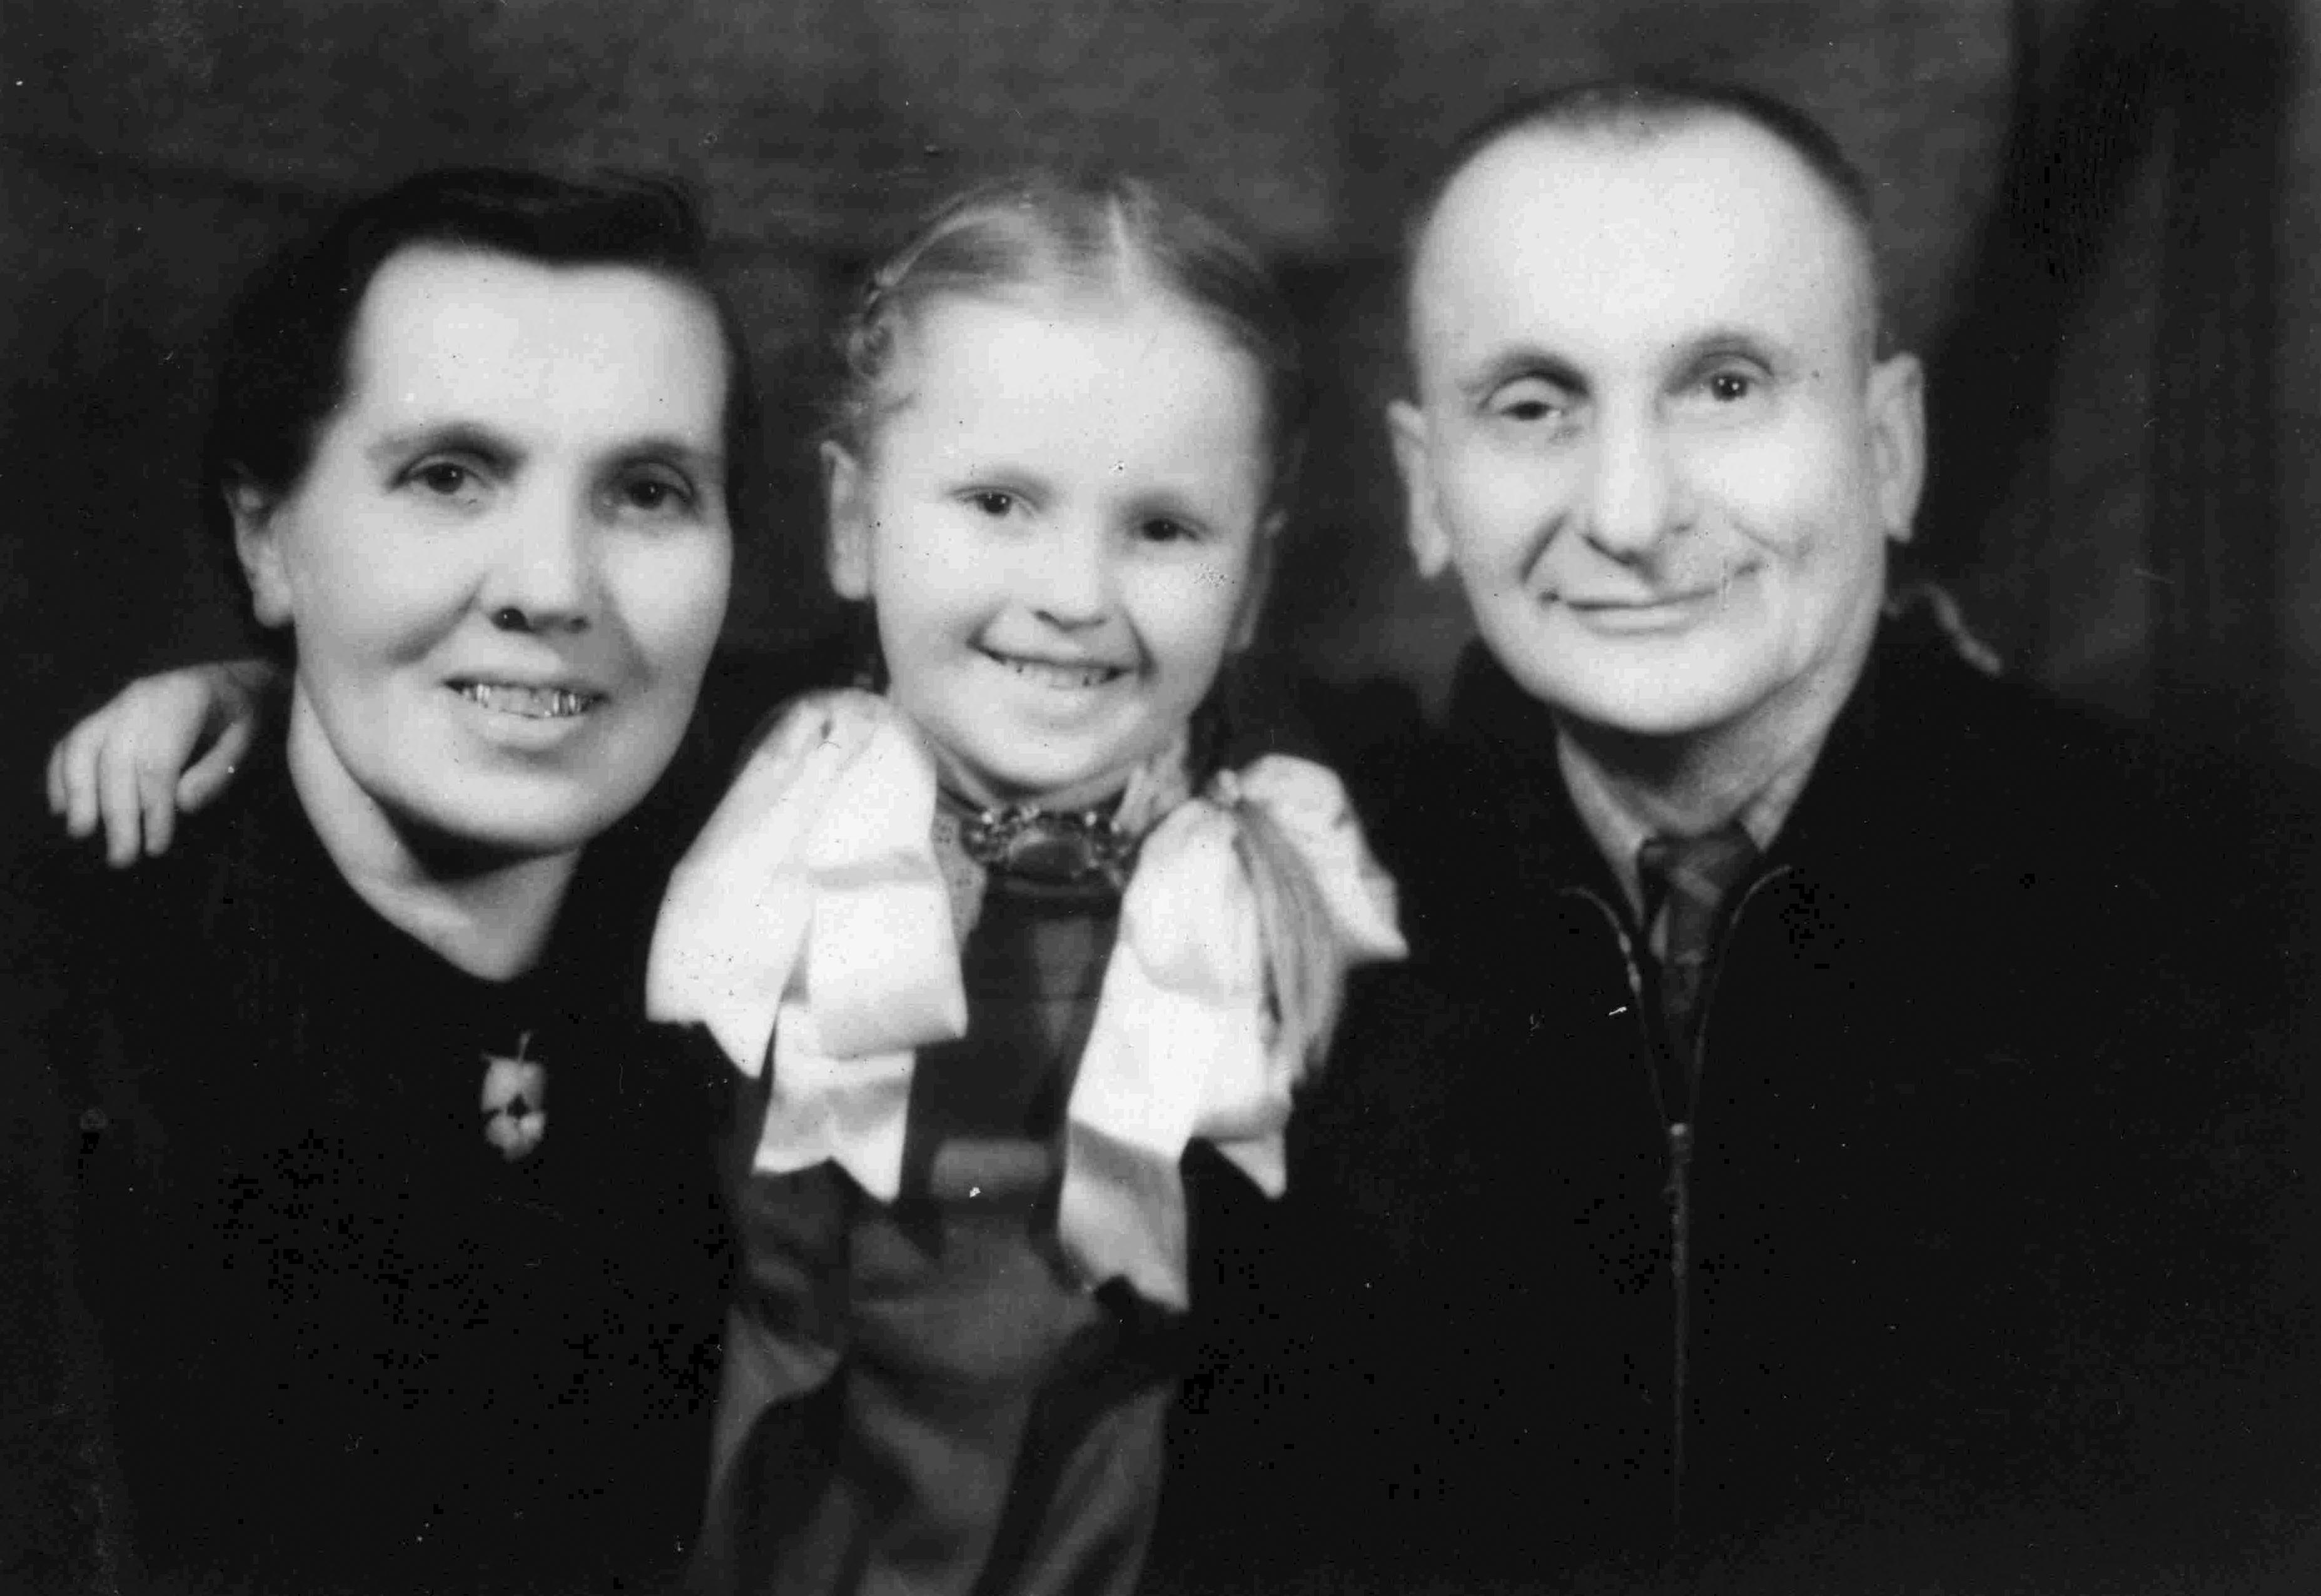 https://www.jmuseum.lt/uploads/userfiles/zuvanciuju_gelbejimo_kryziaus/Dominykas-ir-Stanislava-Mižutavičiai-su-dukra-Stanislava-Elenute.jpg